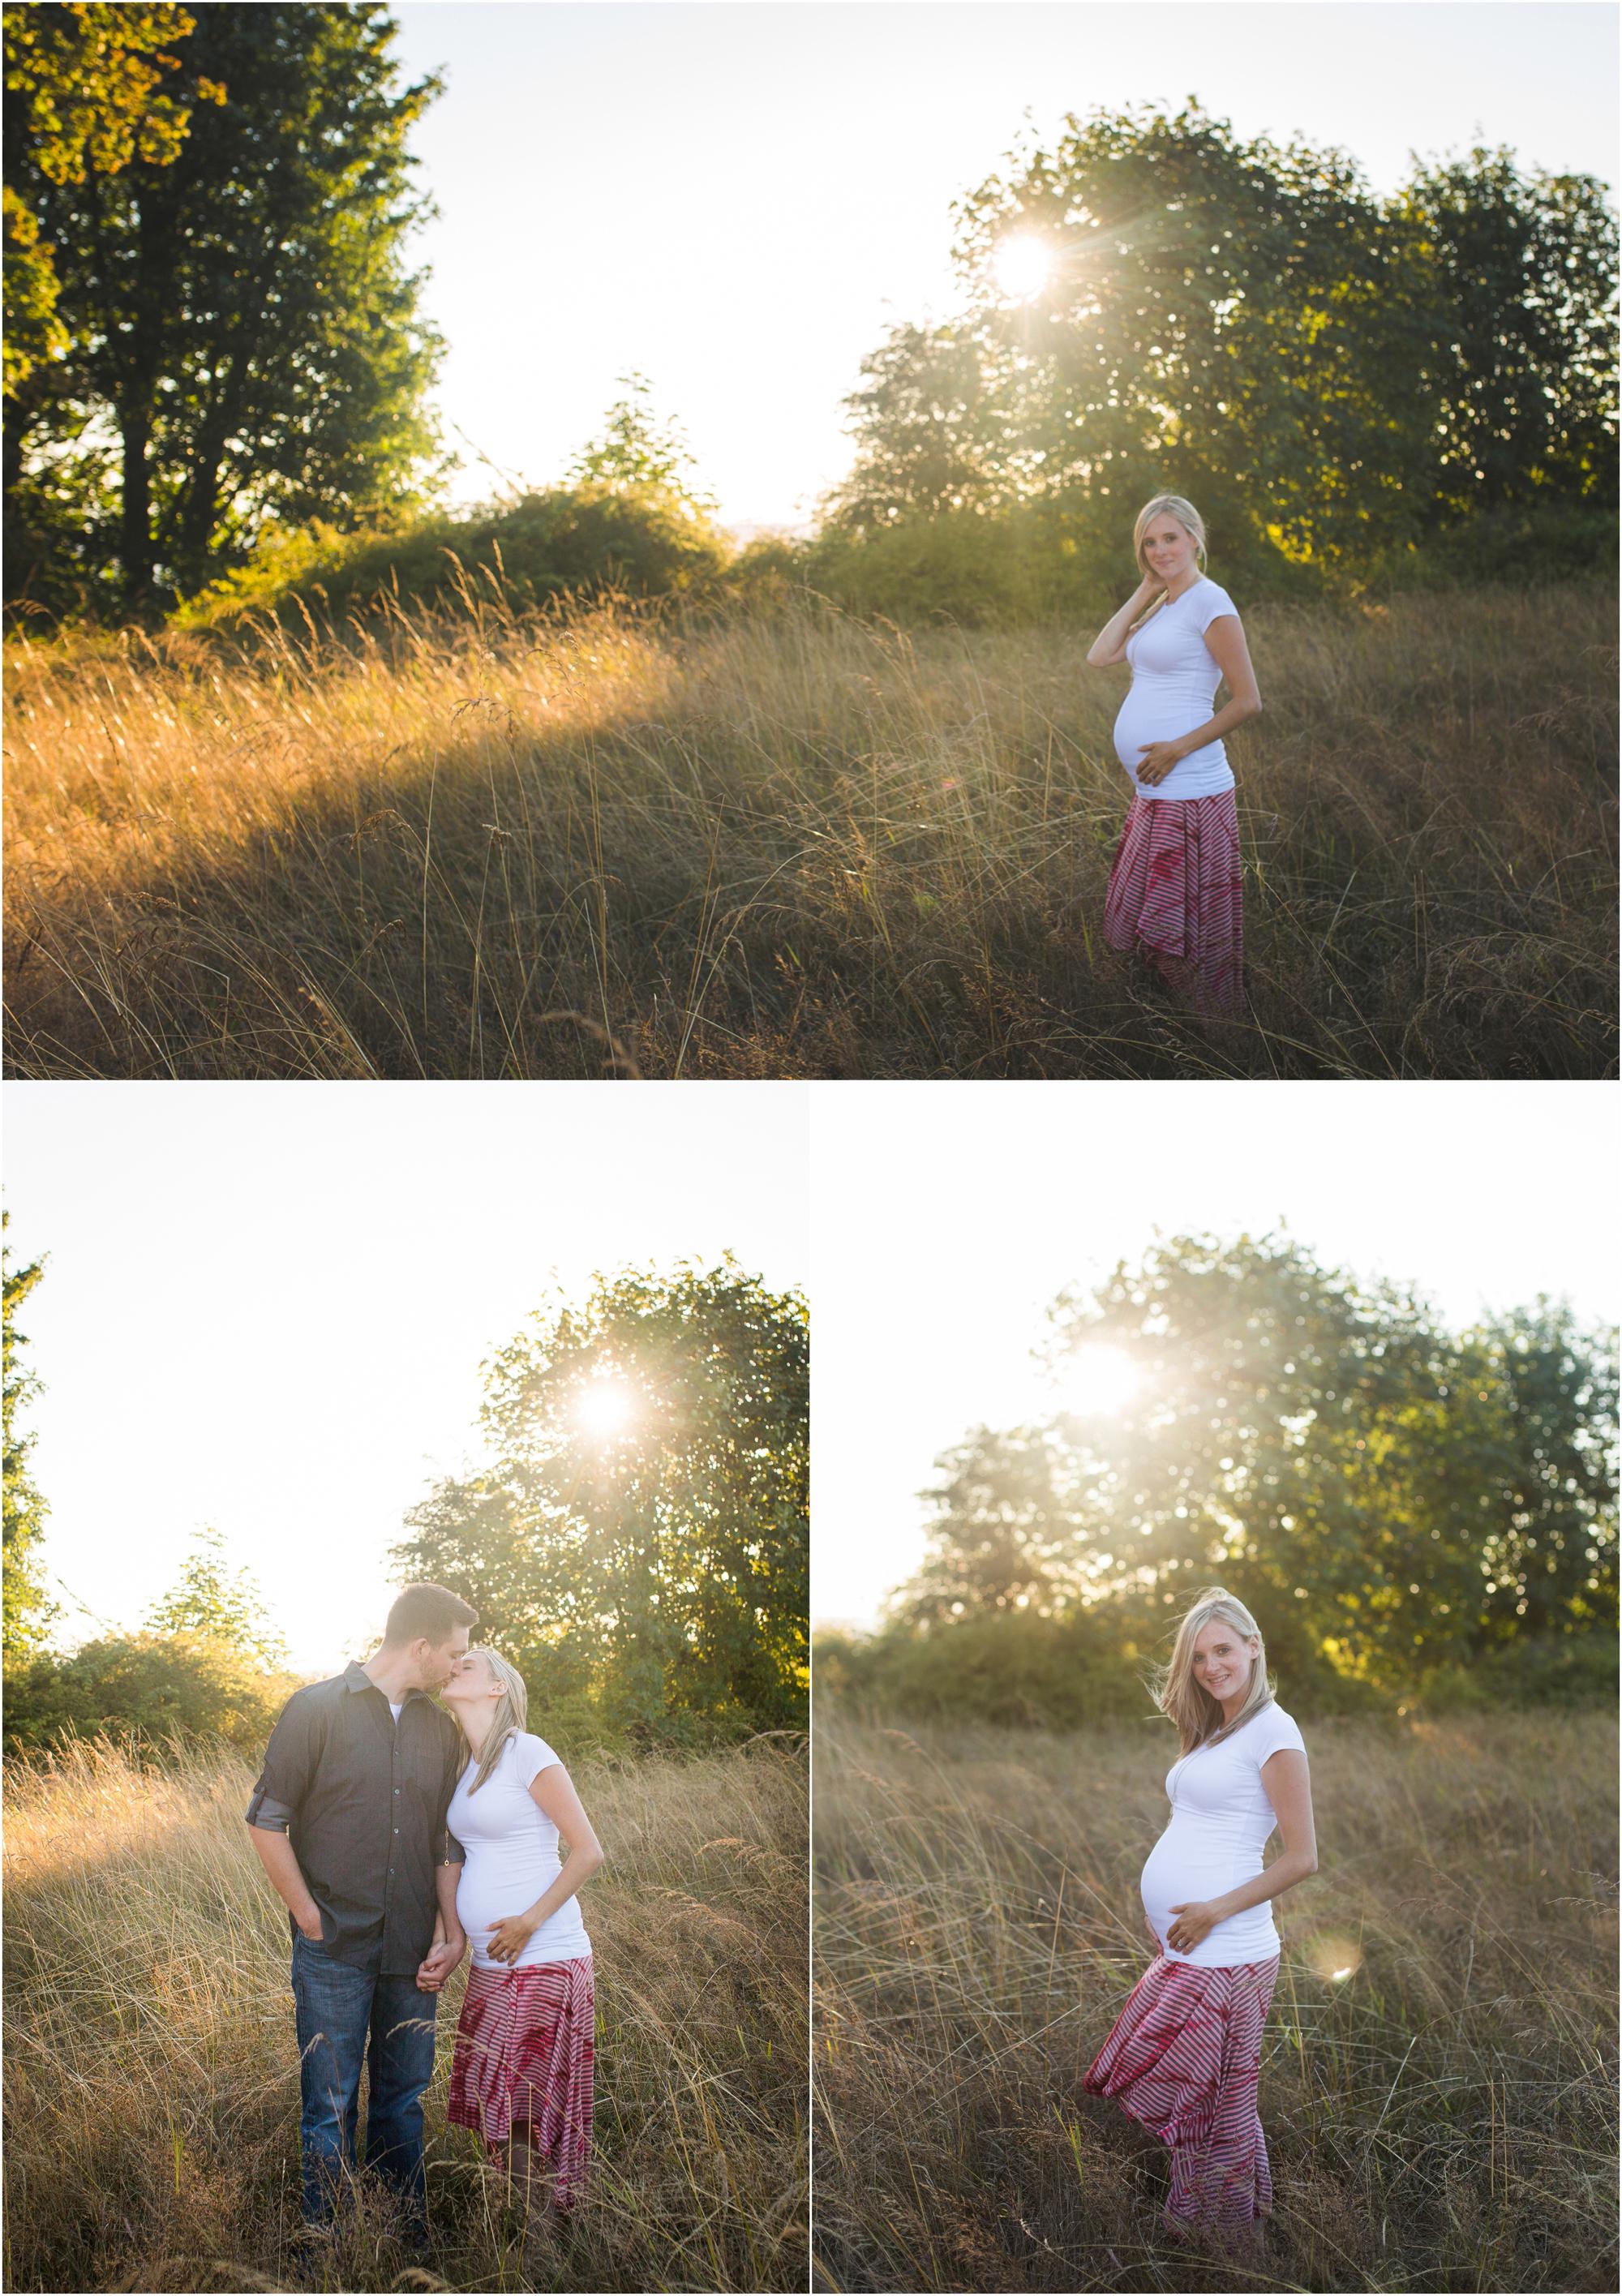 ashley vos photography seattle tacoma area family maternity newborn photographer_0473.jpg